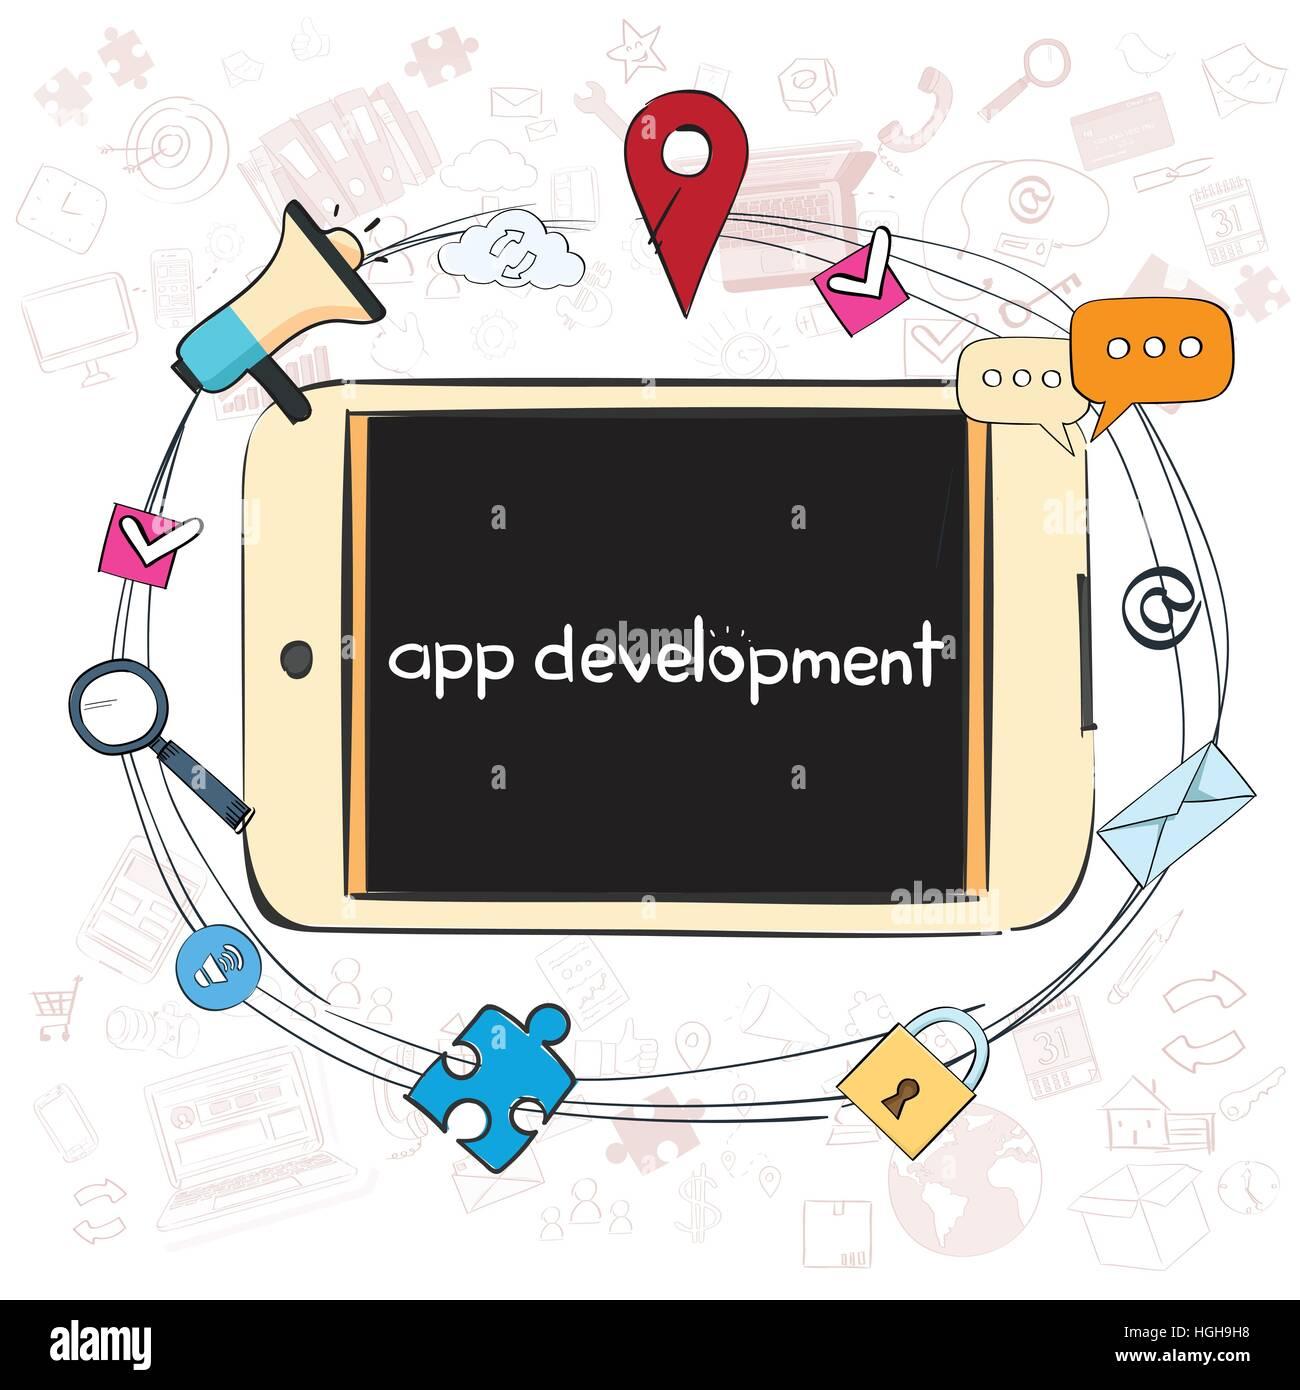 Application Development Creative Process Business Concept Banner